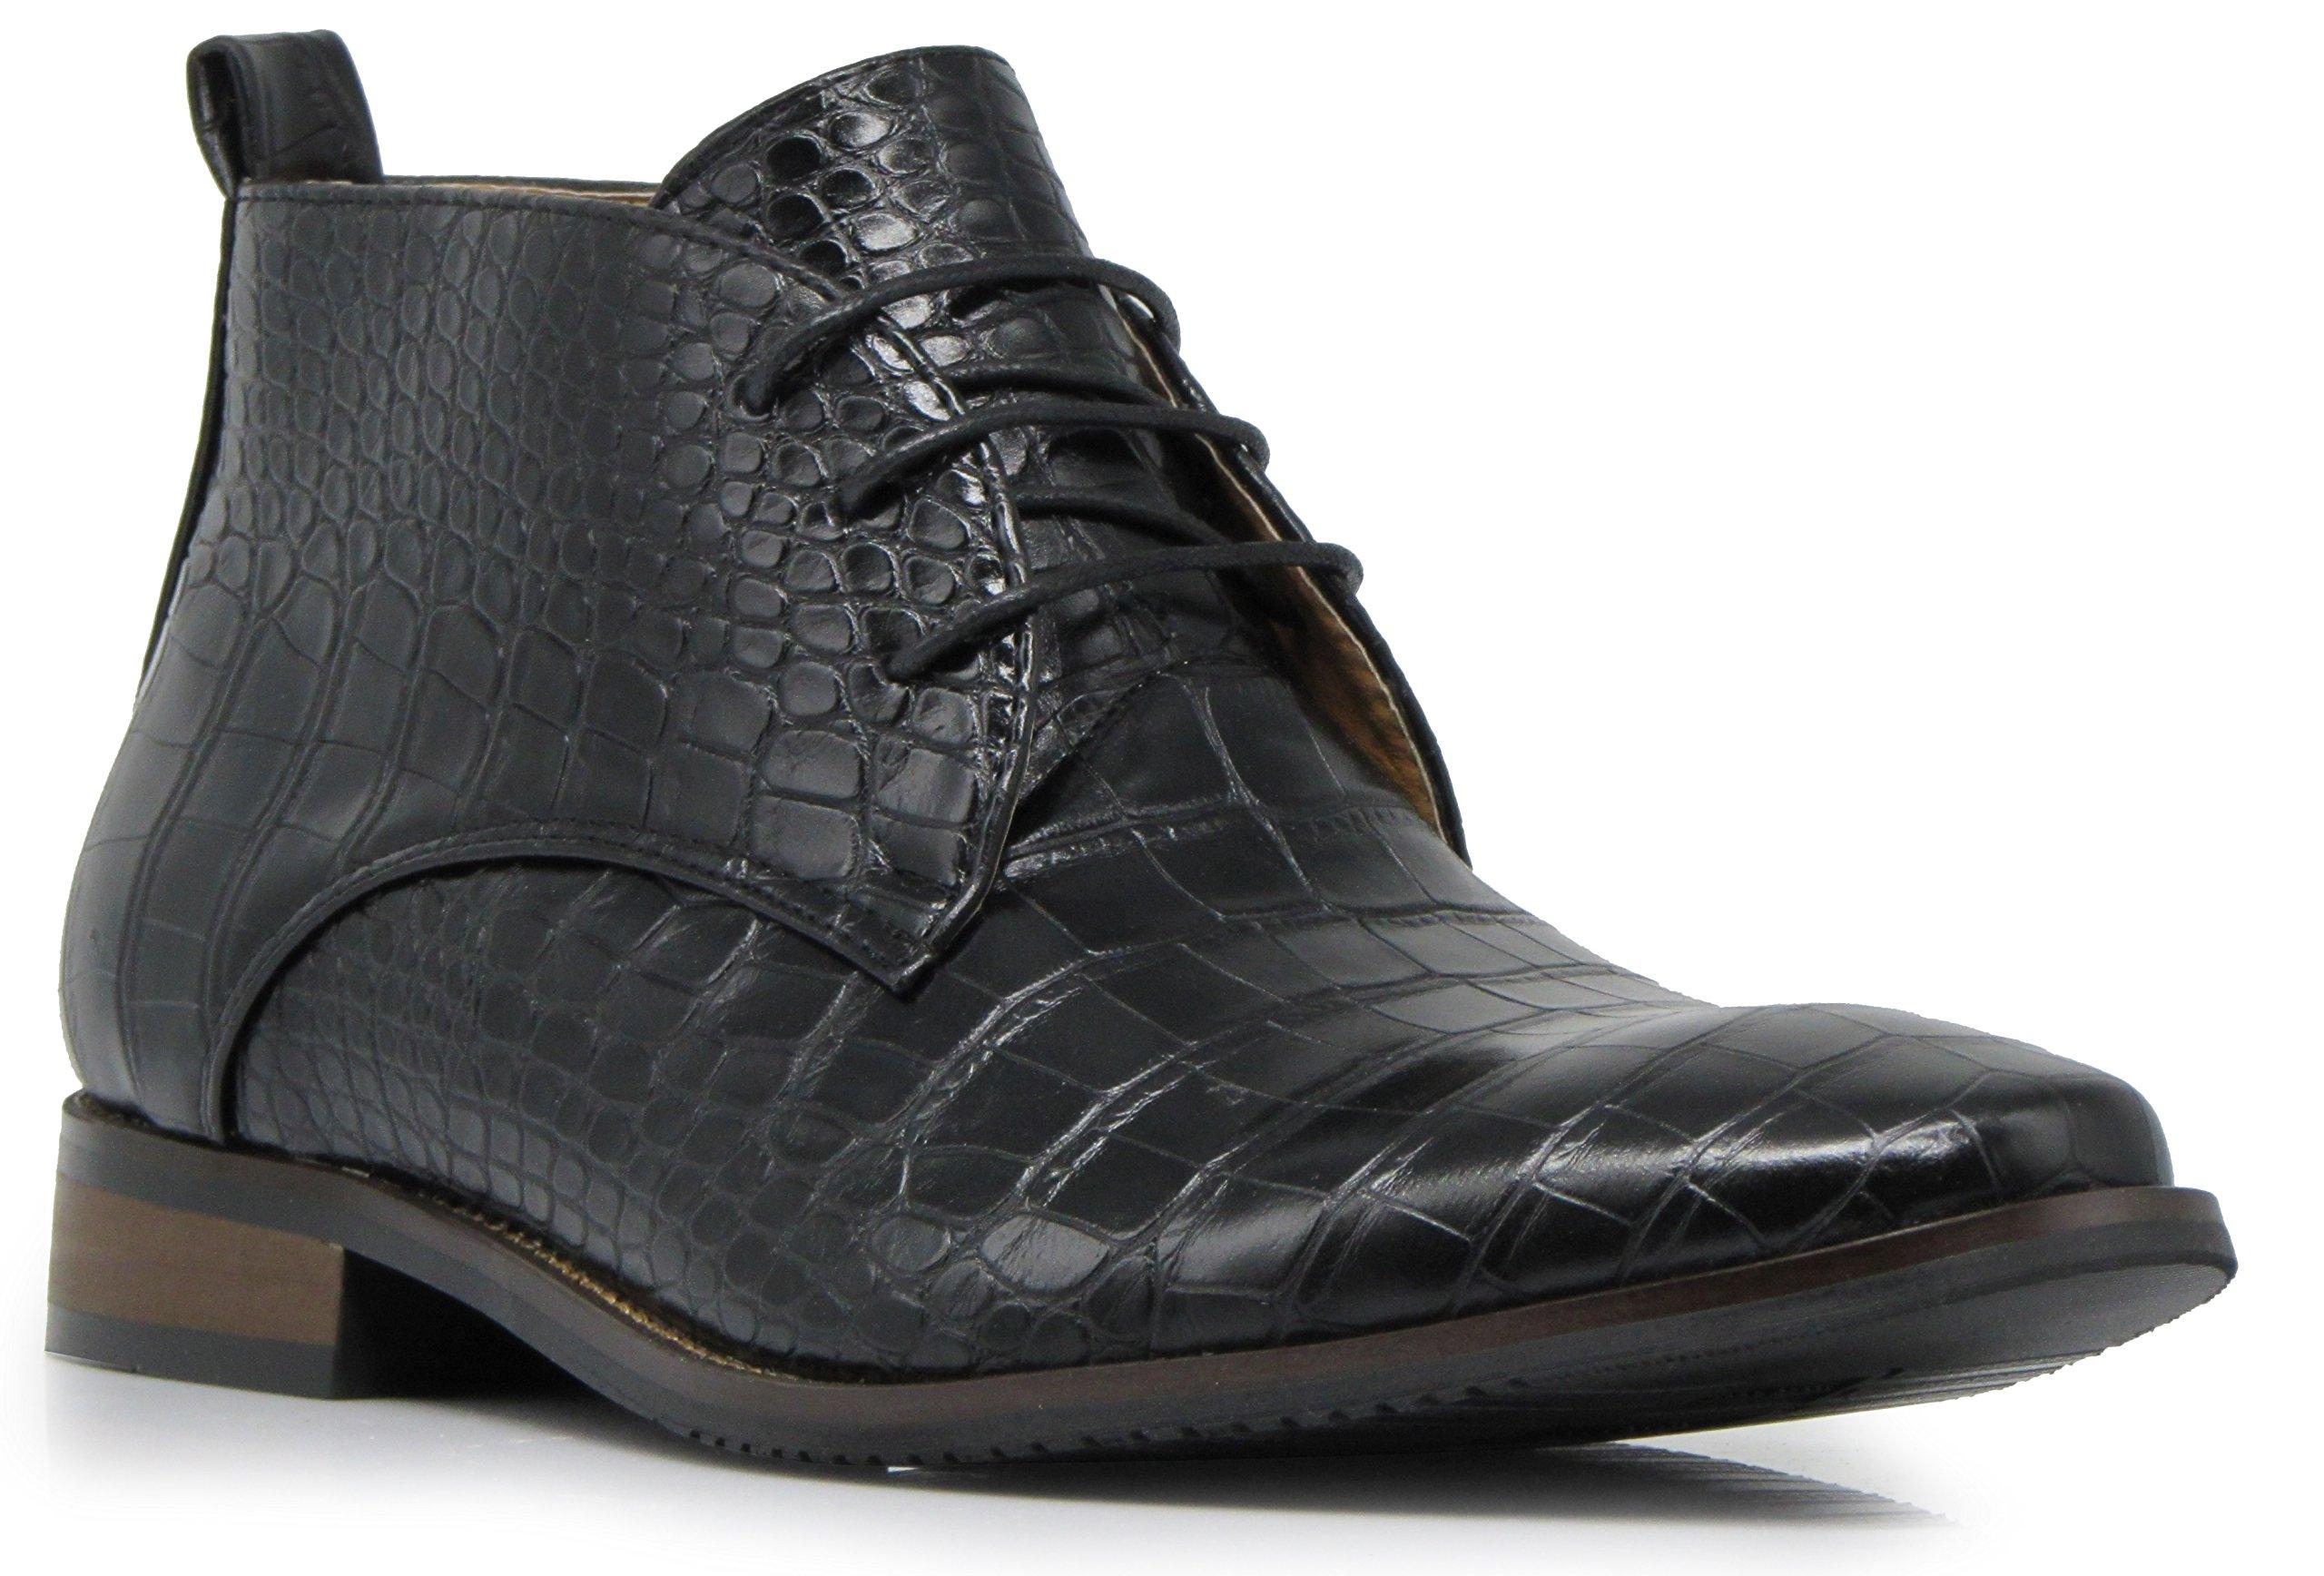 Enzo Romeo DF2 Men's Dress Boots Alligator Crocodile Print Chelsea Chukka Ankle Lace up Fashion Short Boots (9 D(M) US, Black)